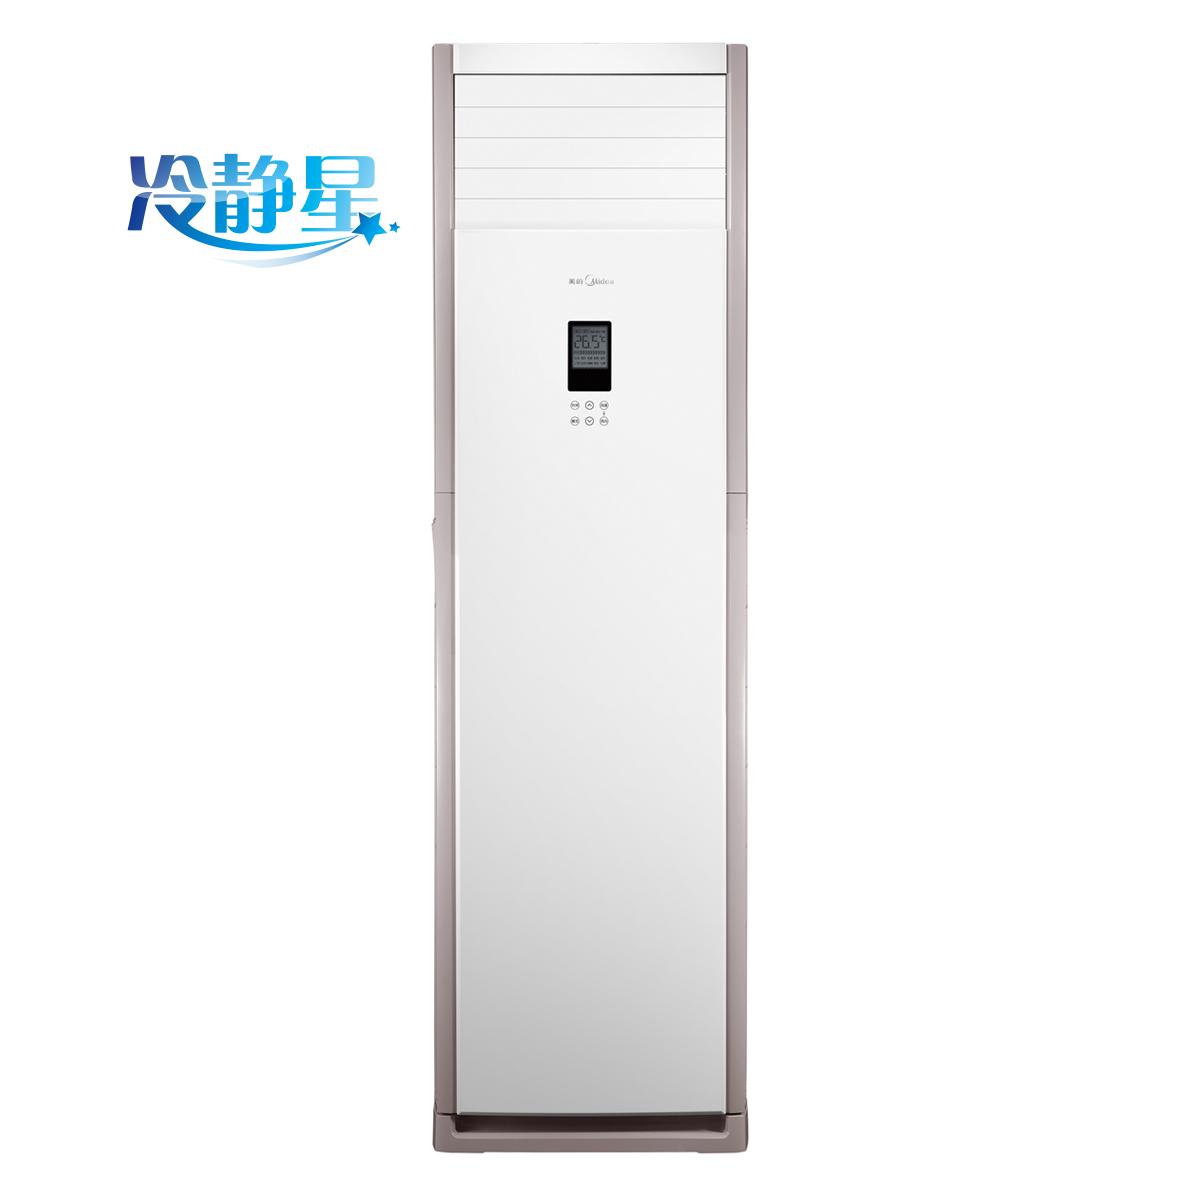 Midea/美的 KFR-120LW/SDY-PA400(R2)(陶瓷白)家用空调套机 说明书.pdf